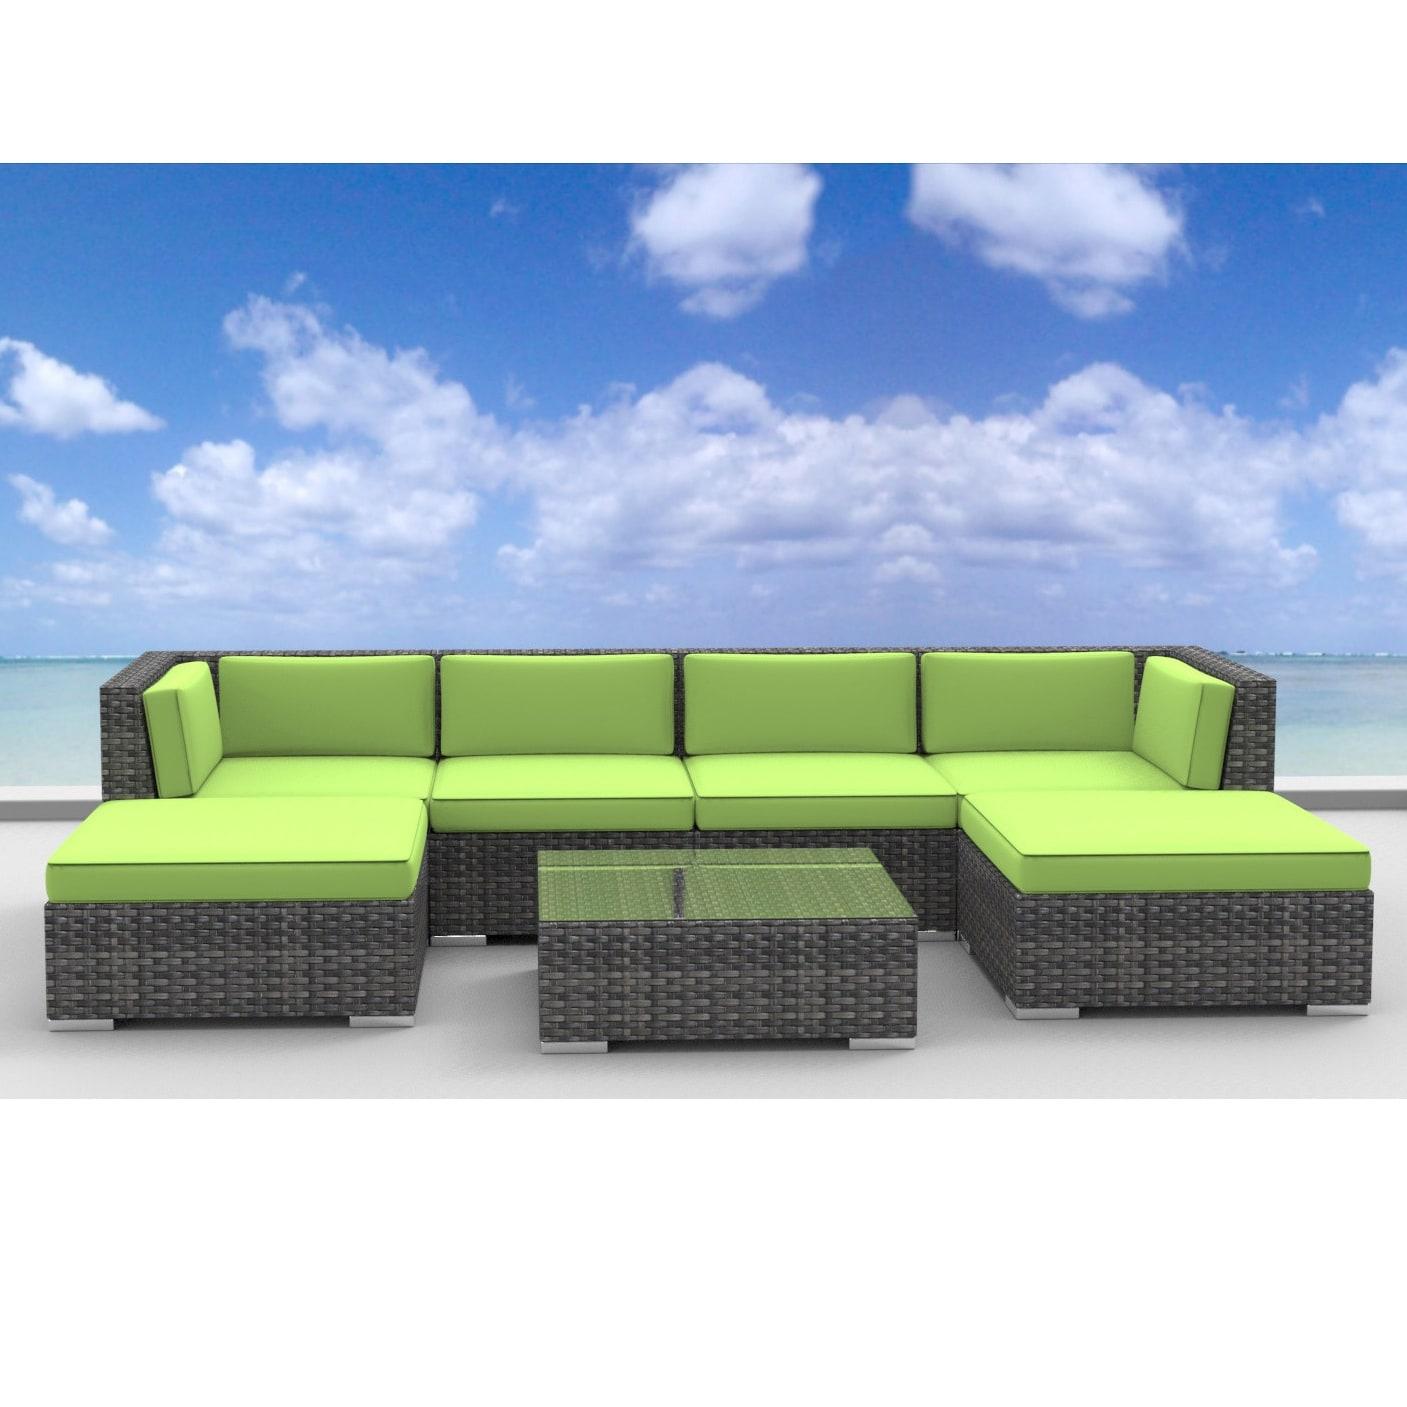 Urban Furnishing Maui Rattan 7 Piece Outdoor Sectional Sofa Patio Furniture Set